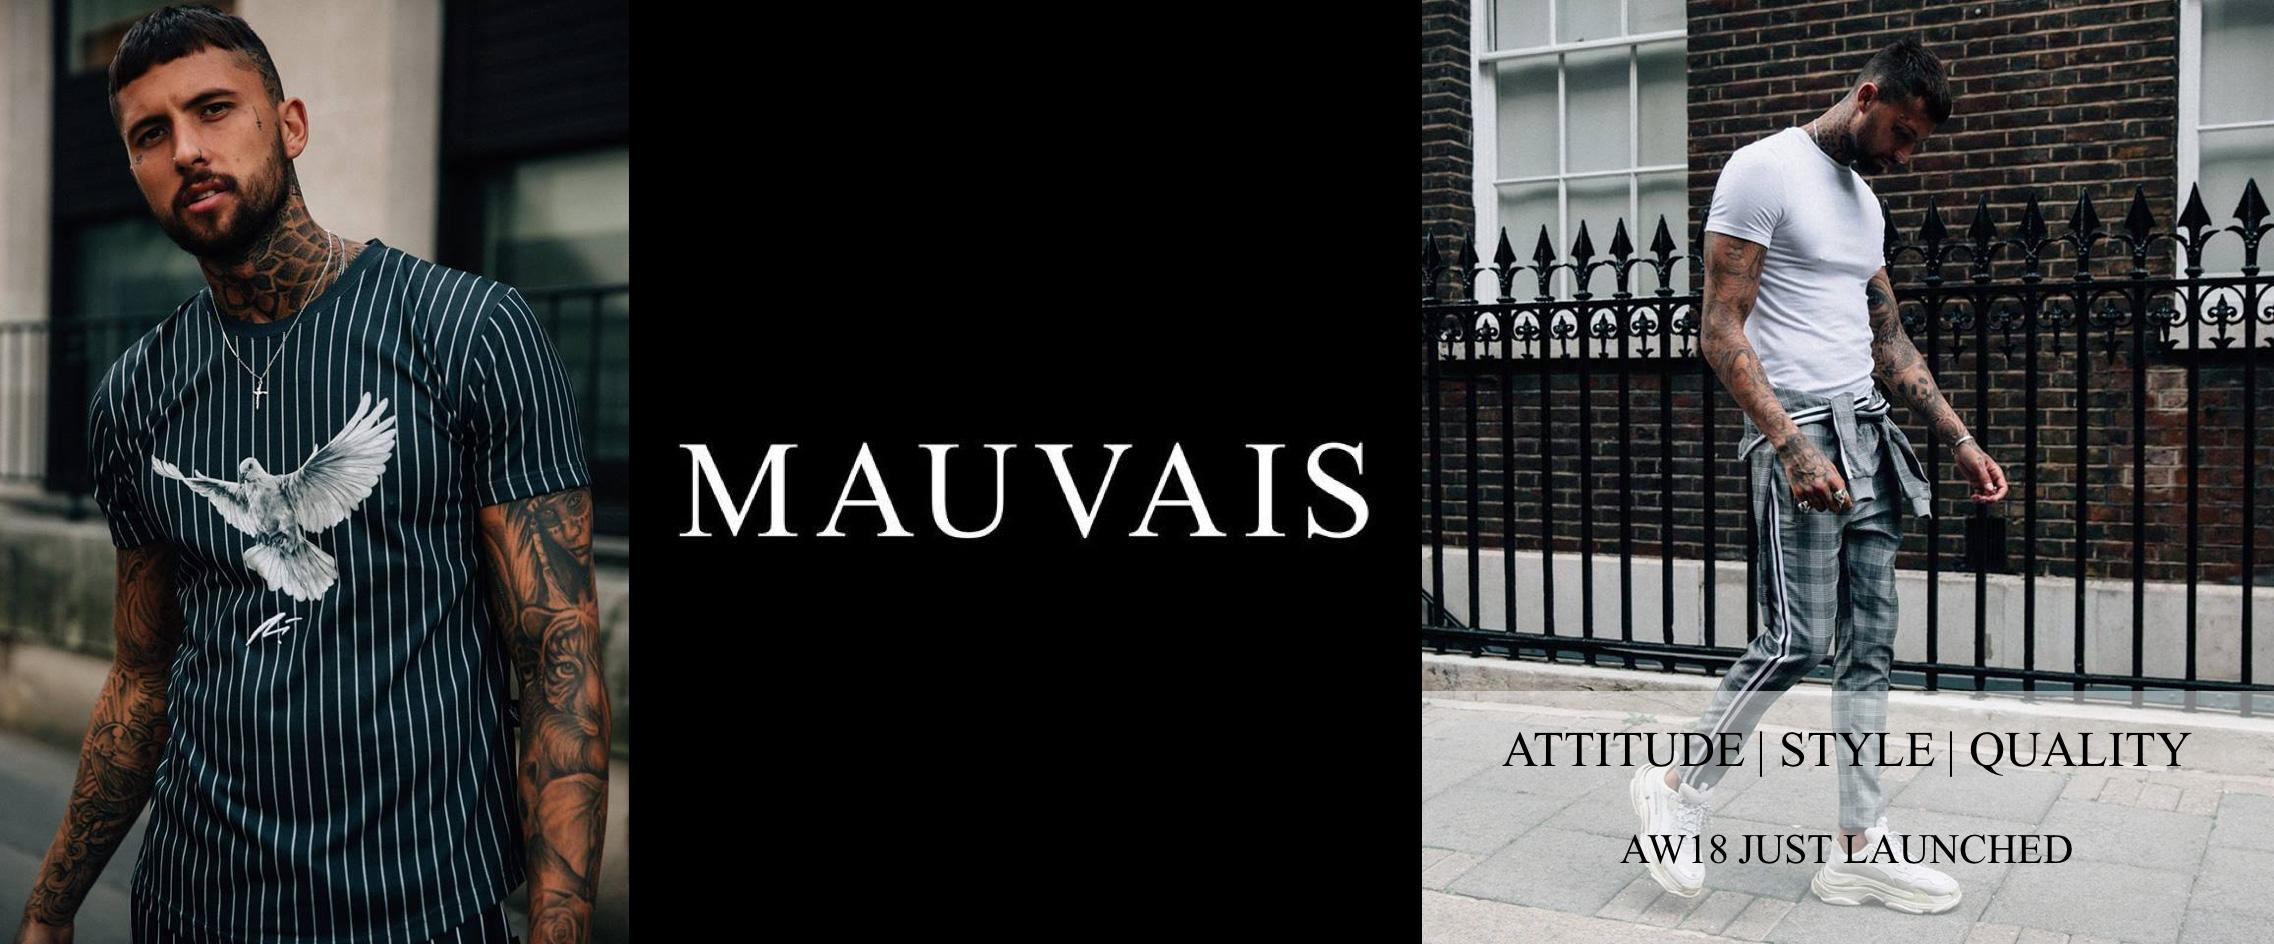 MAUVAIS-MAIN-IMAGE-min